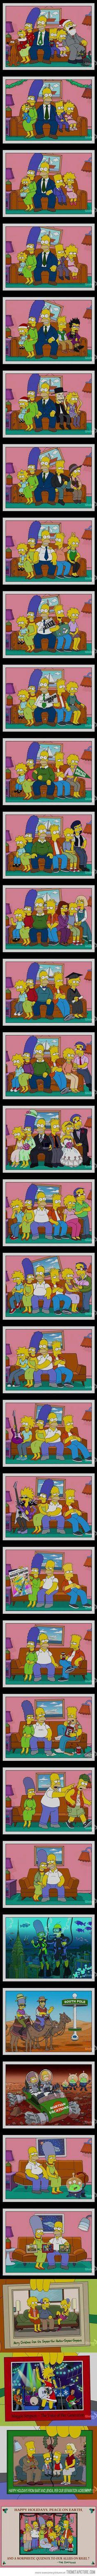 The Simpsons' Christmas Card Photos Through The Years